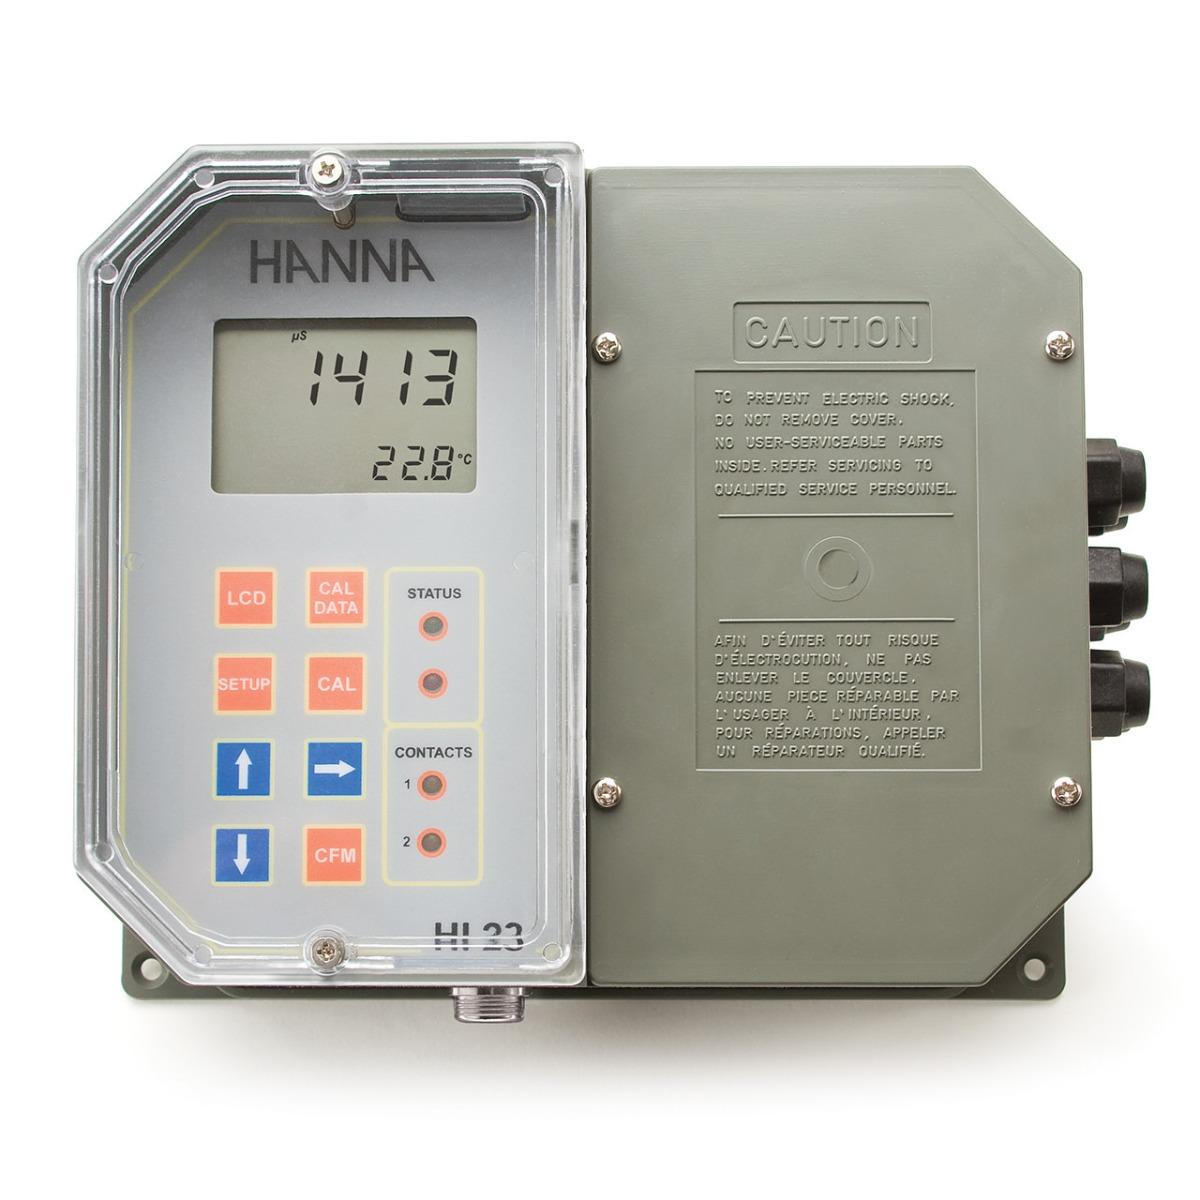 HI23211-2 Wall Mounted EC Digital Controller